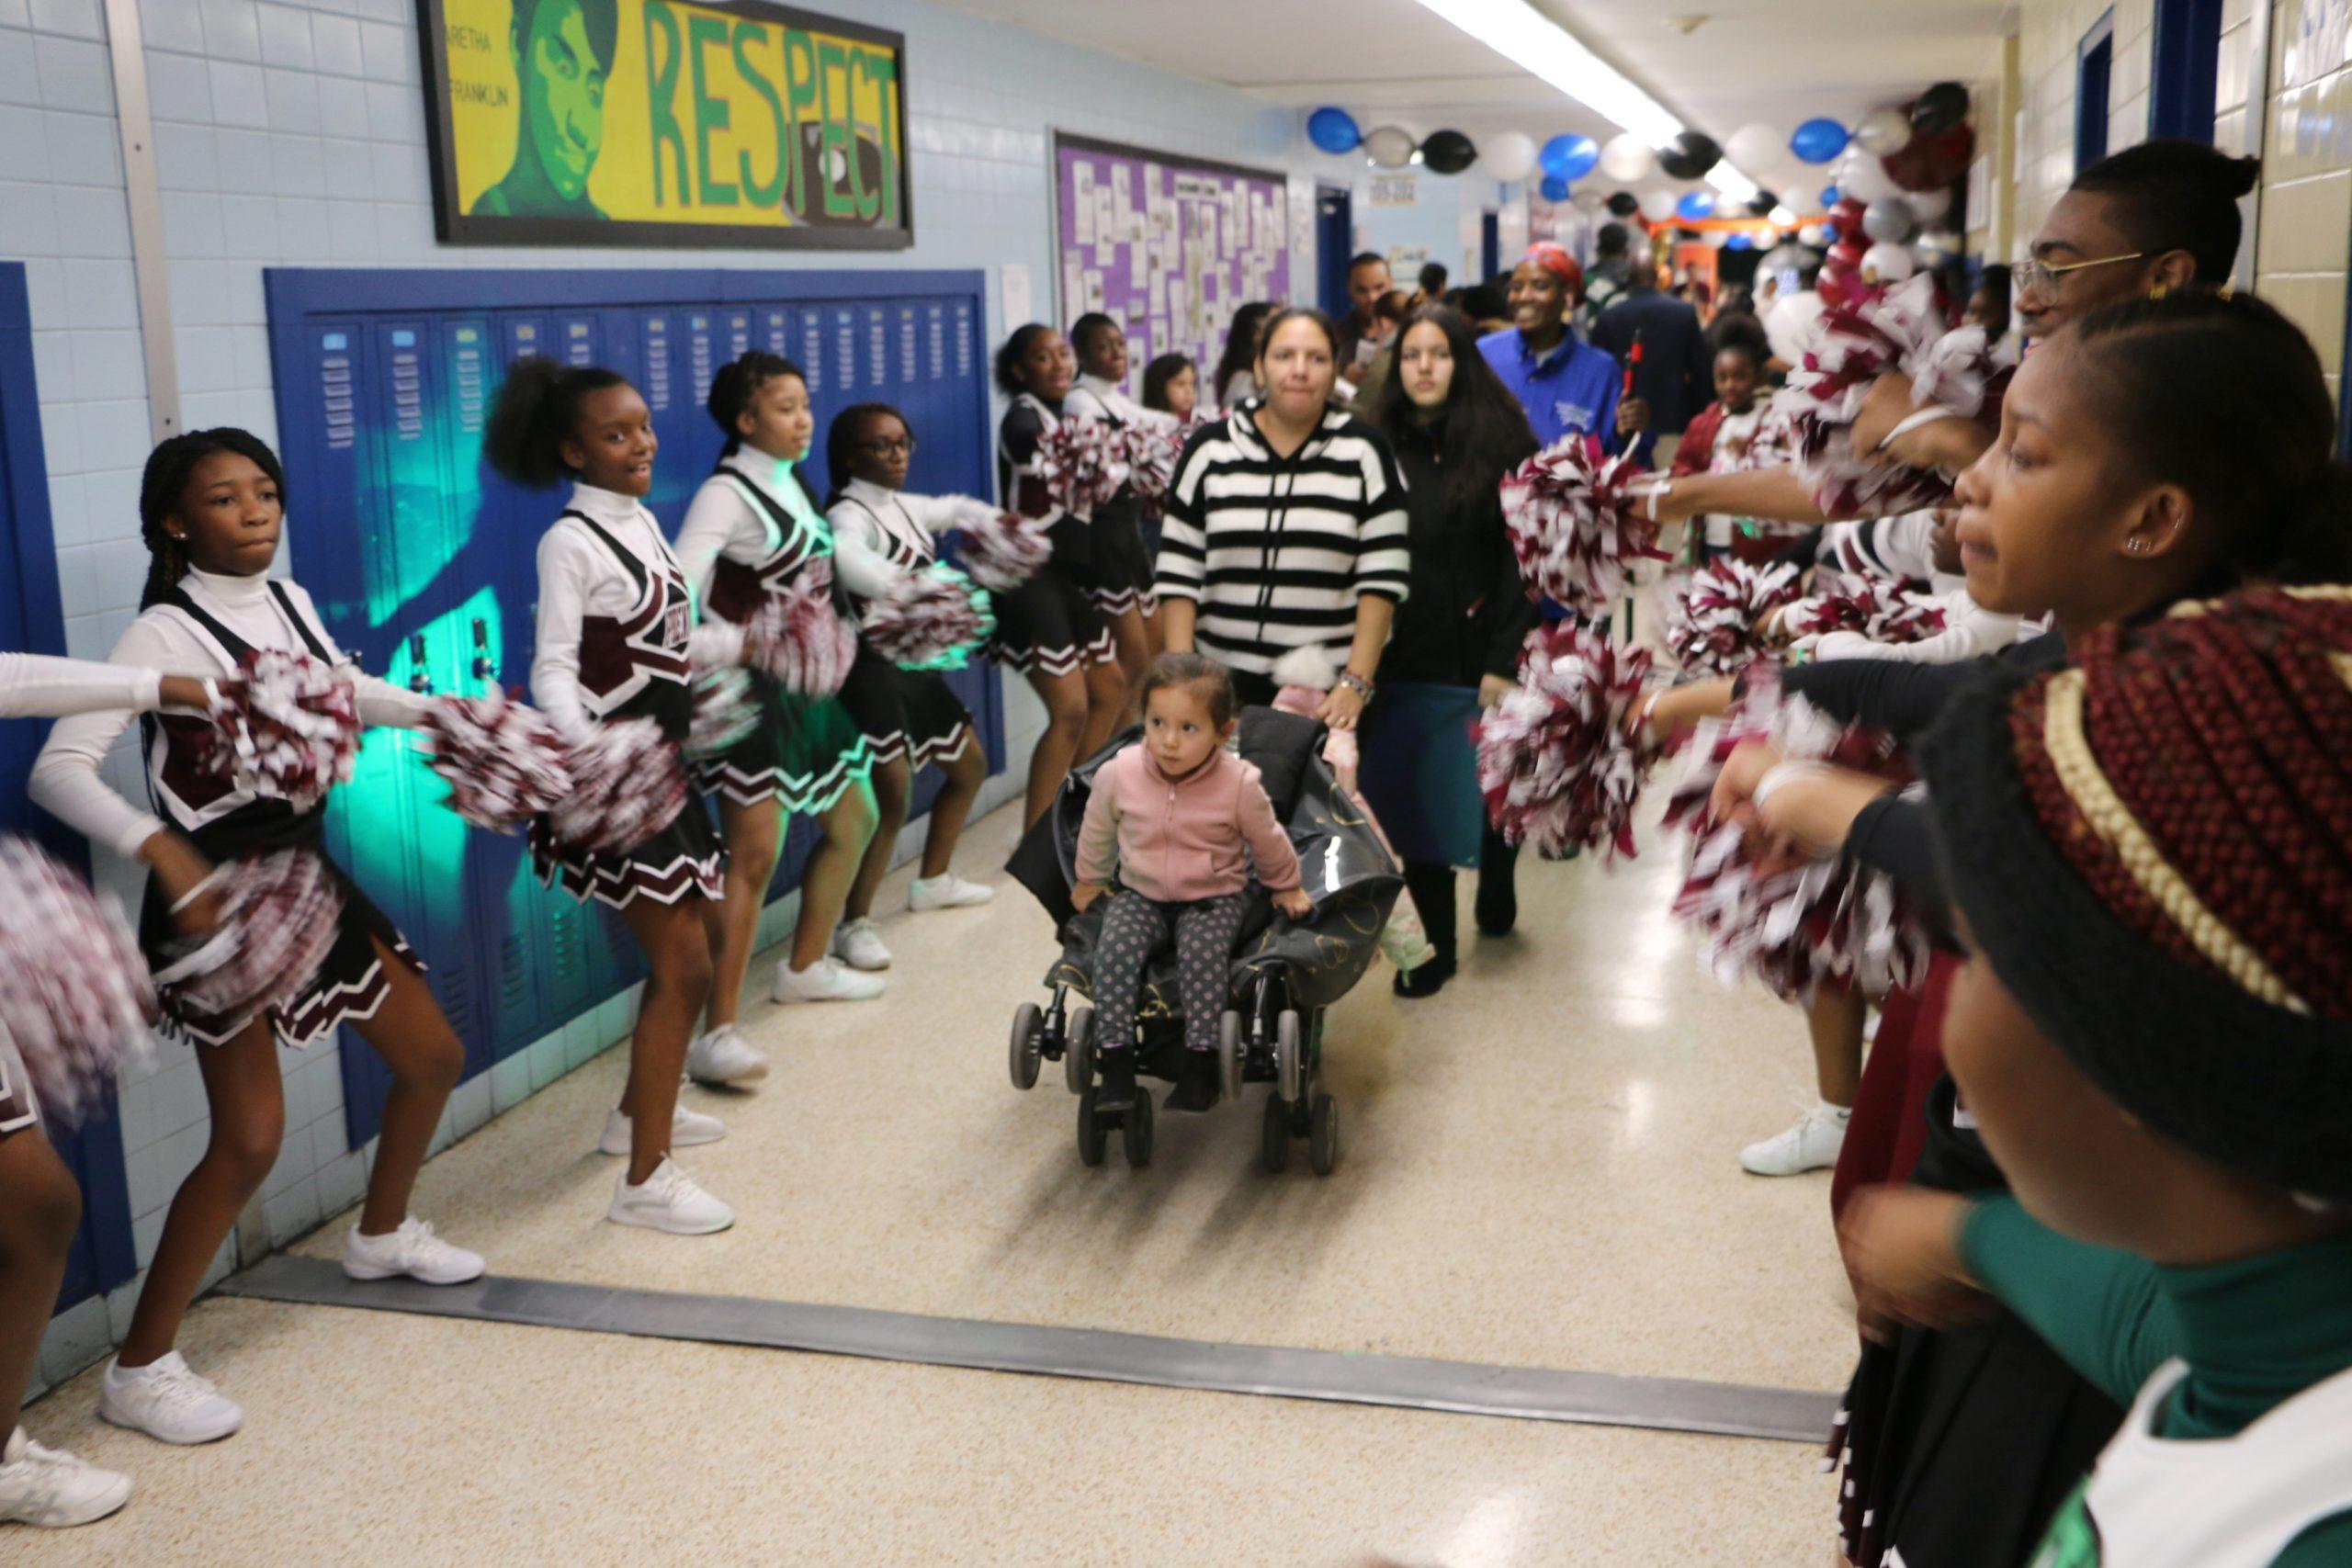 Cheerleaders from University High School greeted families at Newark's school enrollment fair on Saturday.